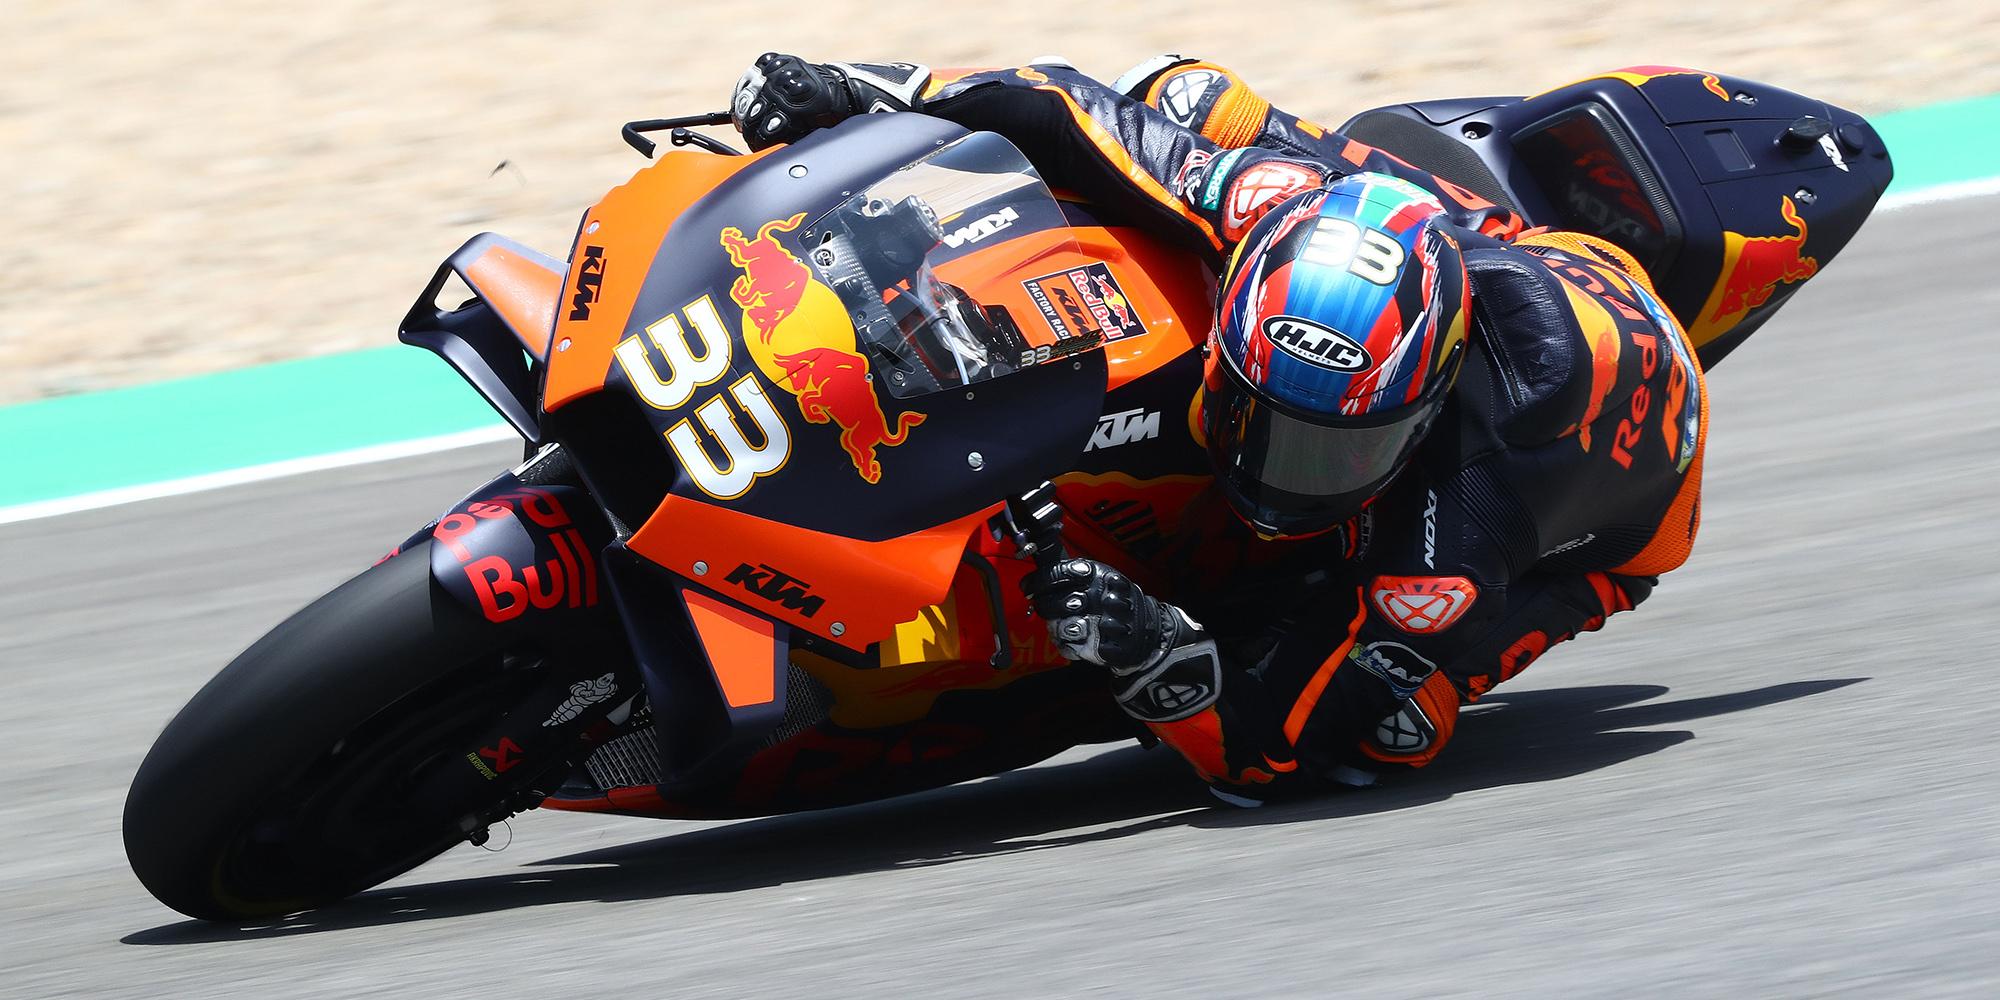 Brad Binder during the 2020 MotoGP Spanish Grand Prix